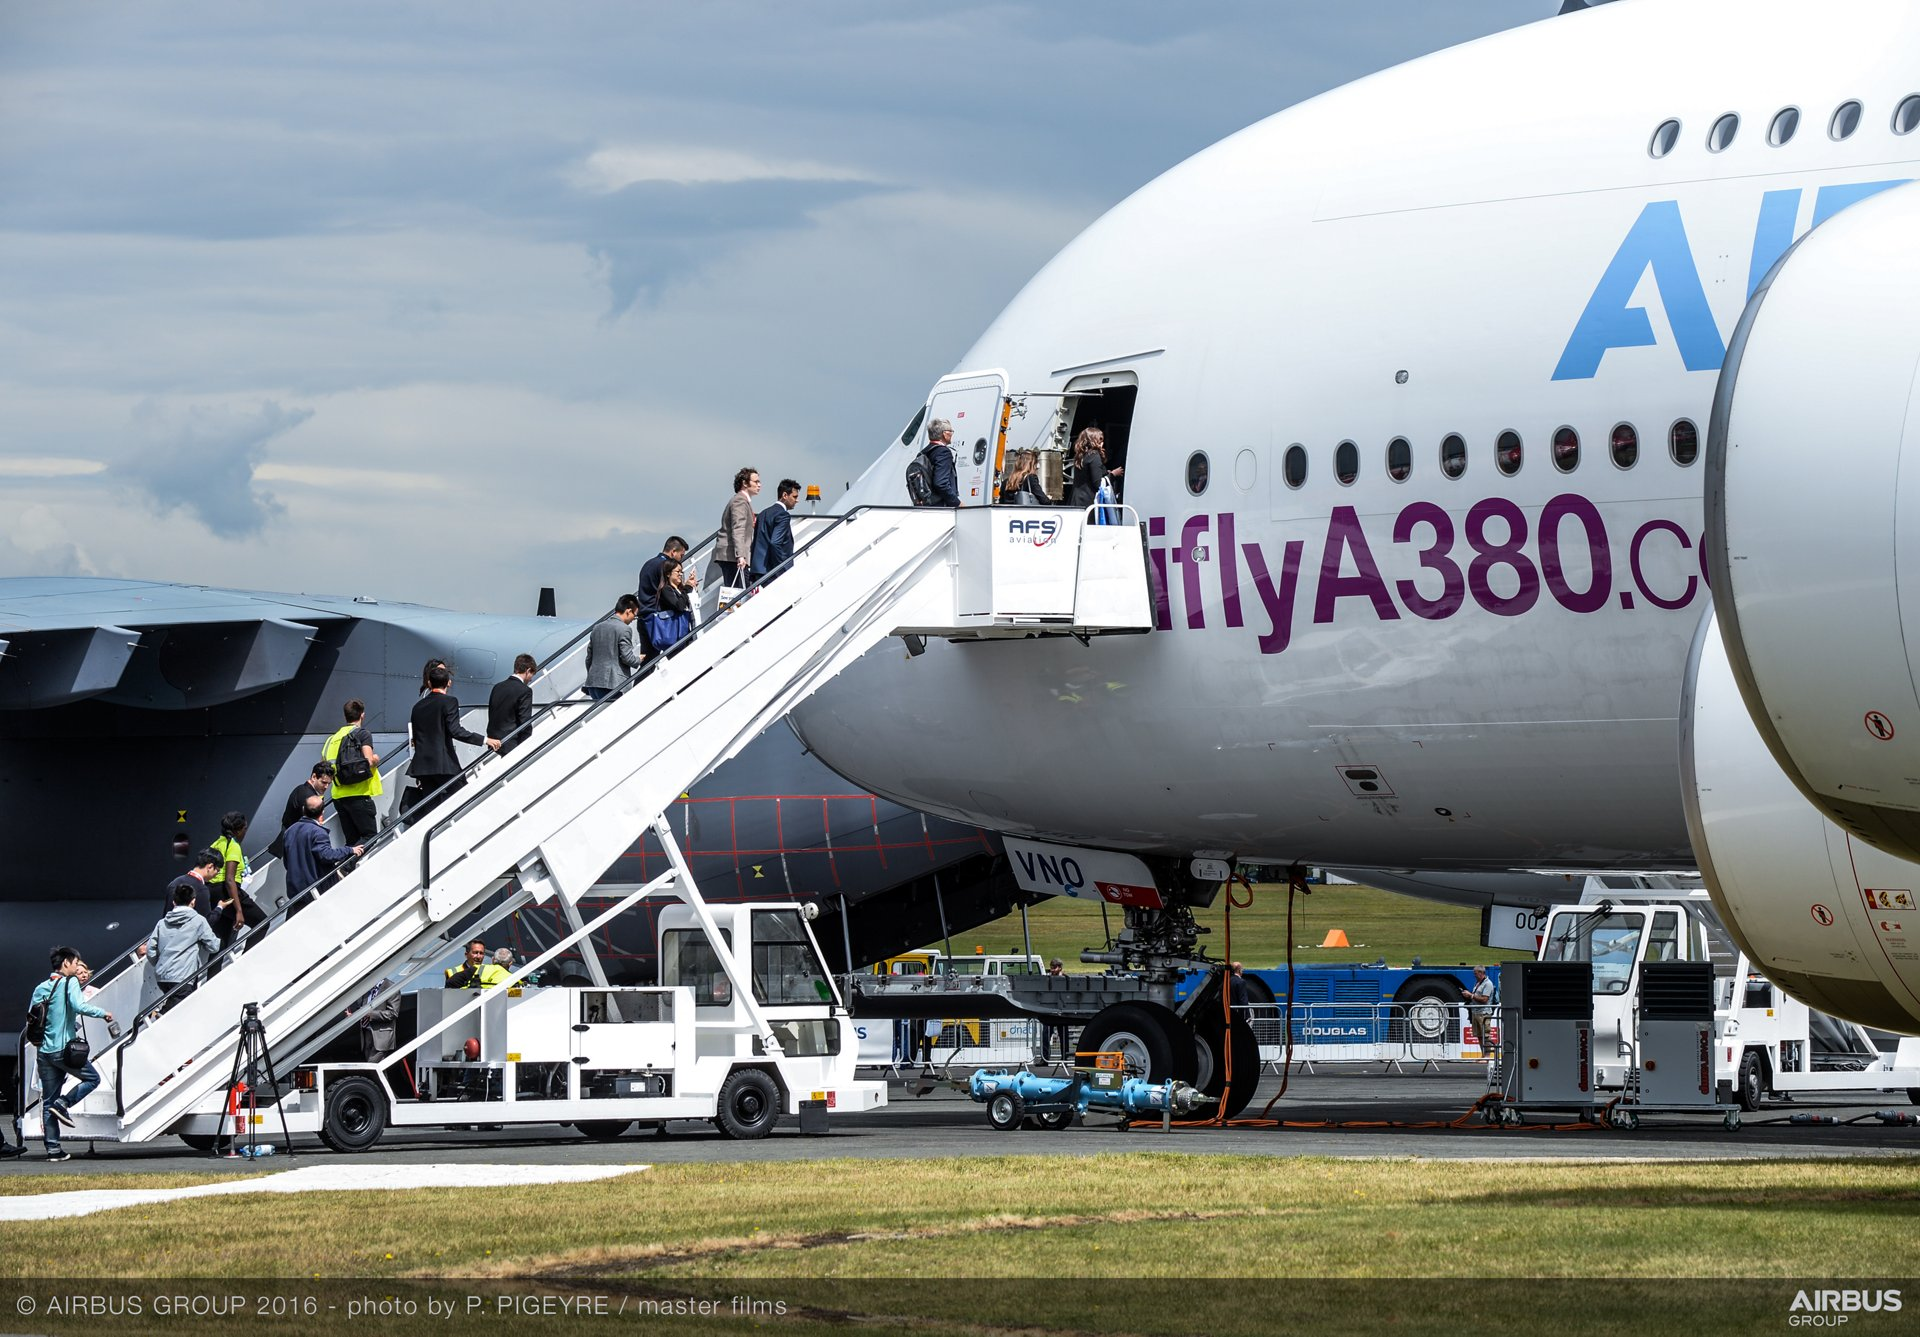 Farnborough Airshow_Day 3_Ambiance 4